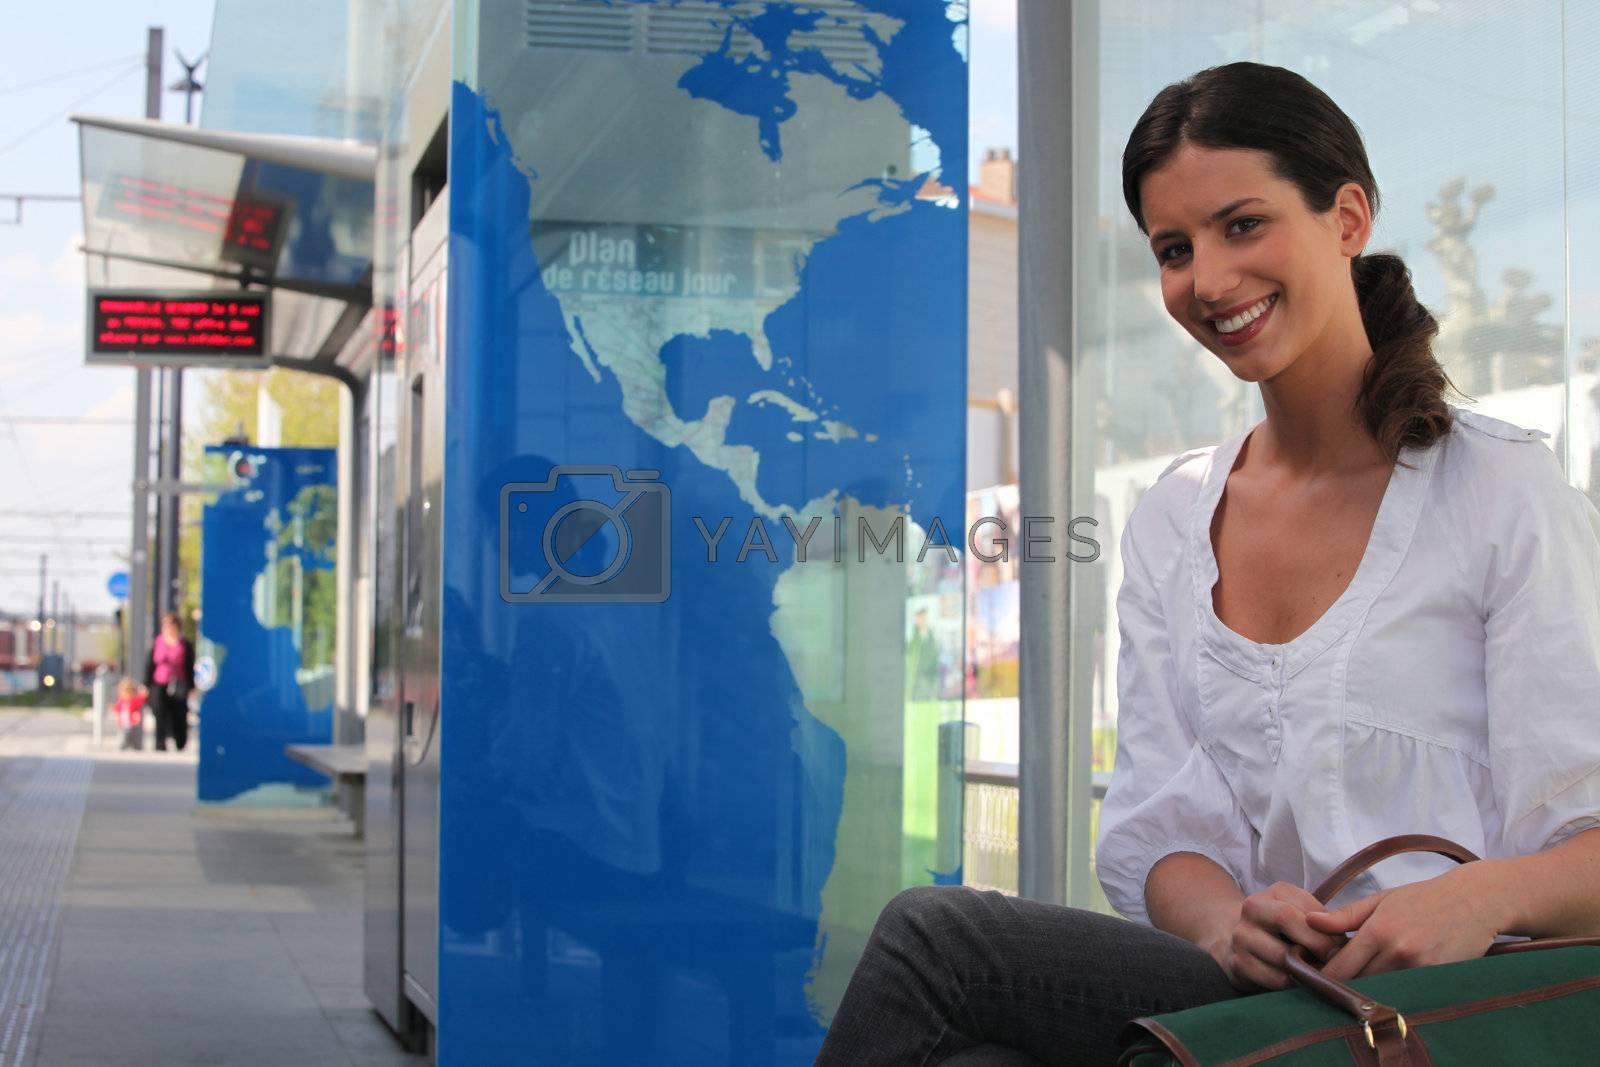 Woman in public transport by phovoir